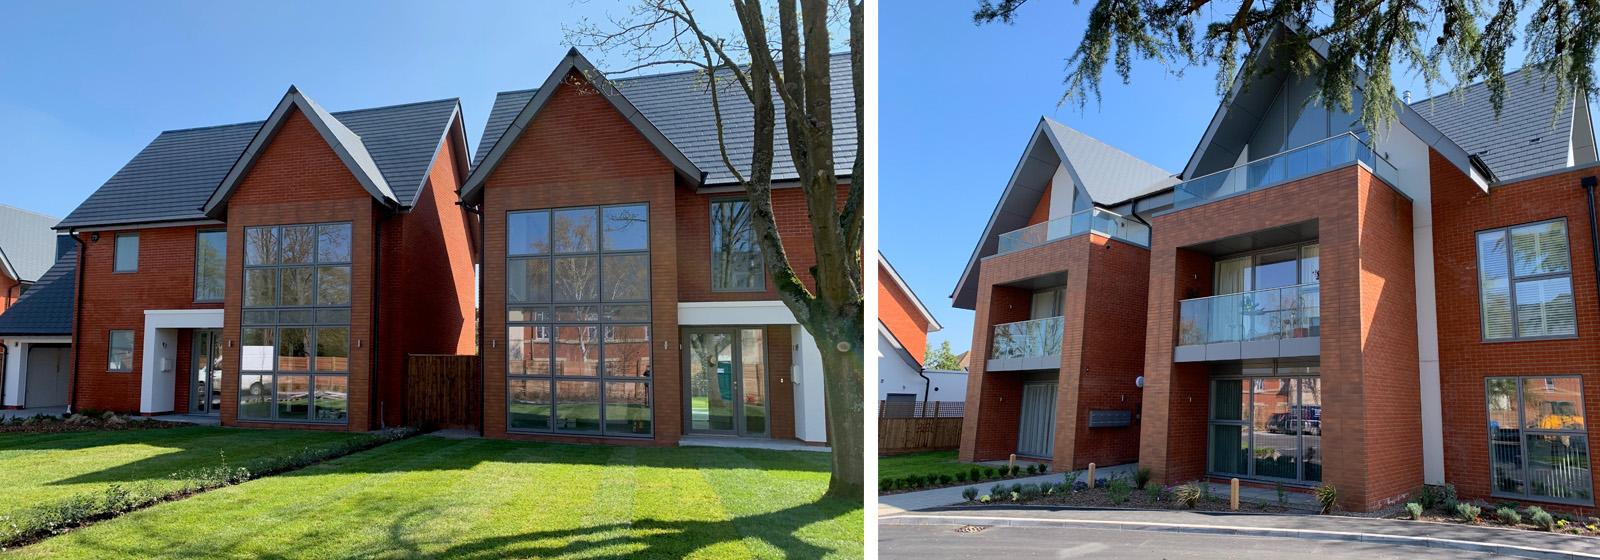 Hafod Road Residential Development